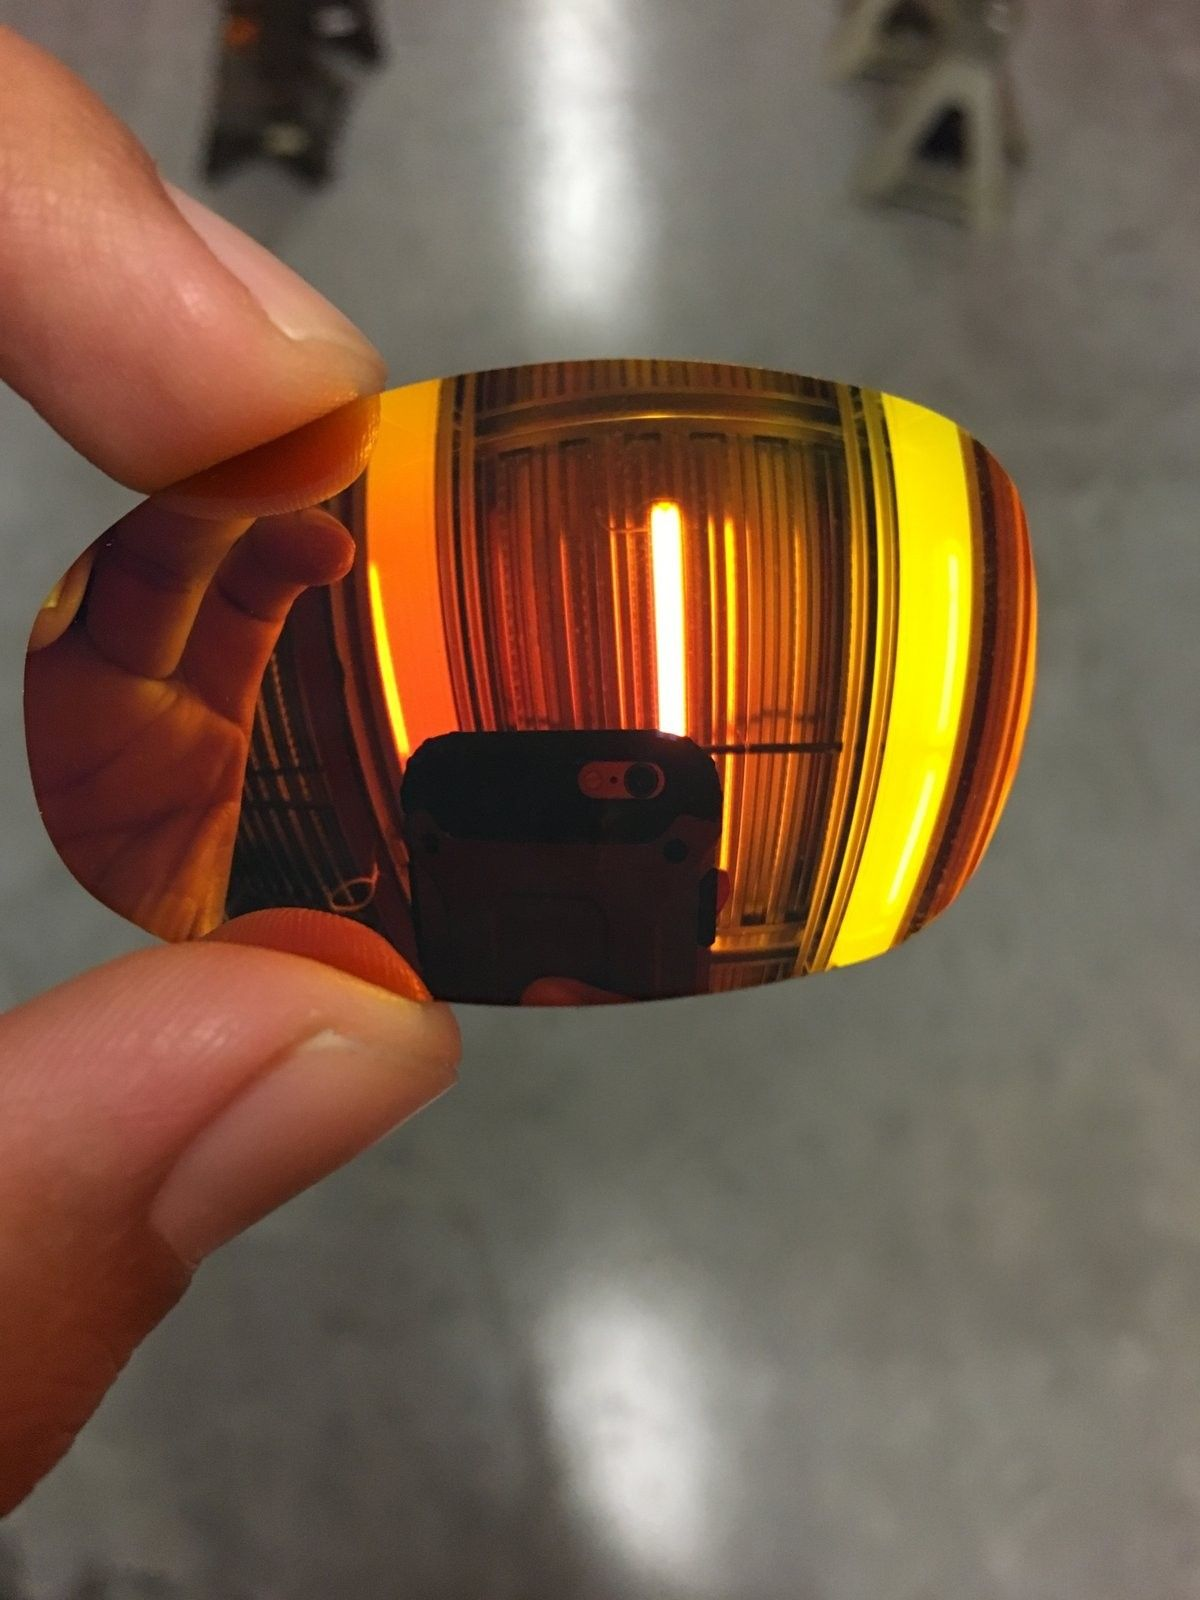 Lens help! - image.jpeg